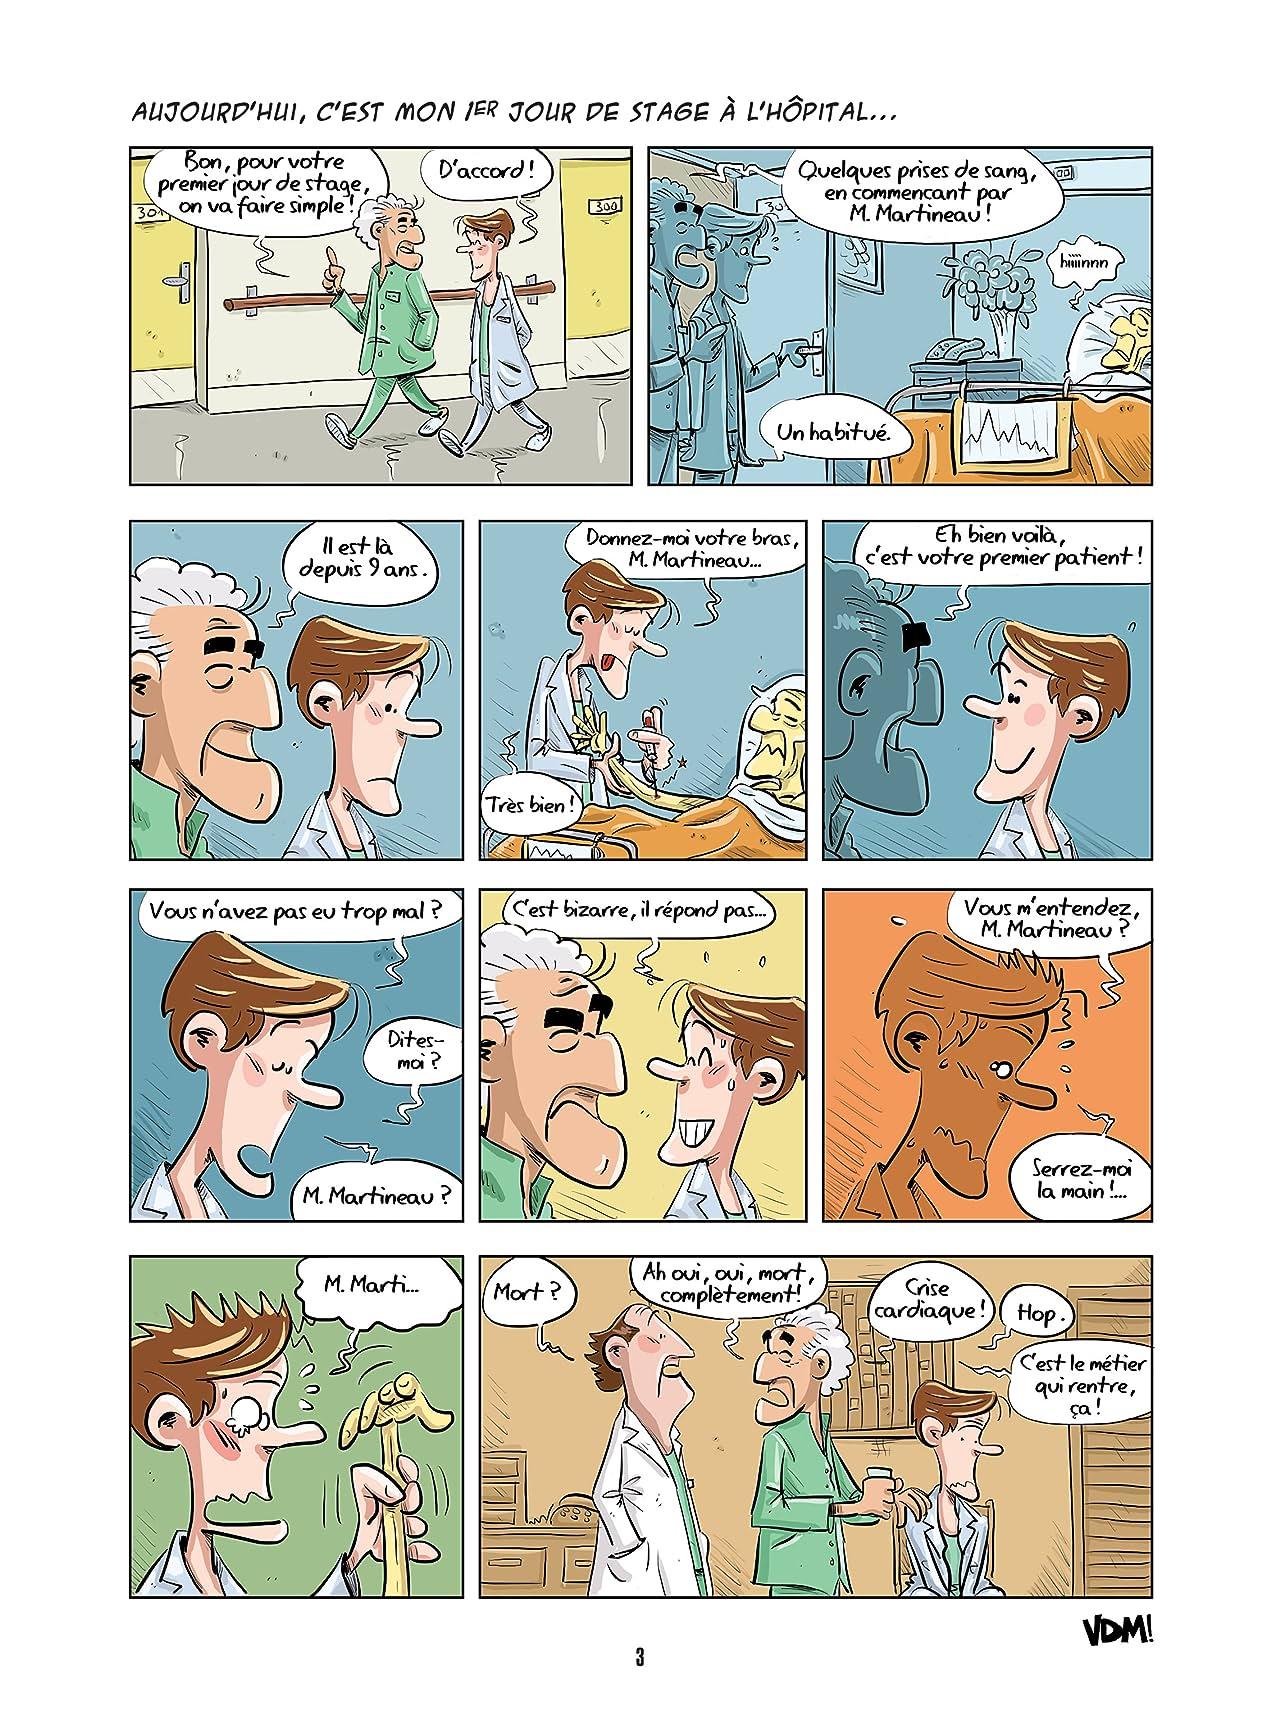 VDM Vol. 2: au boulot